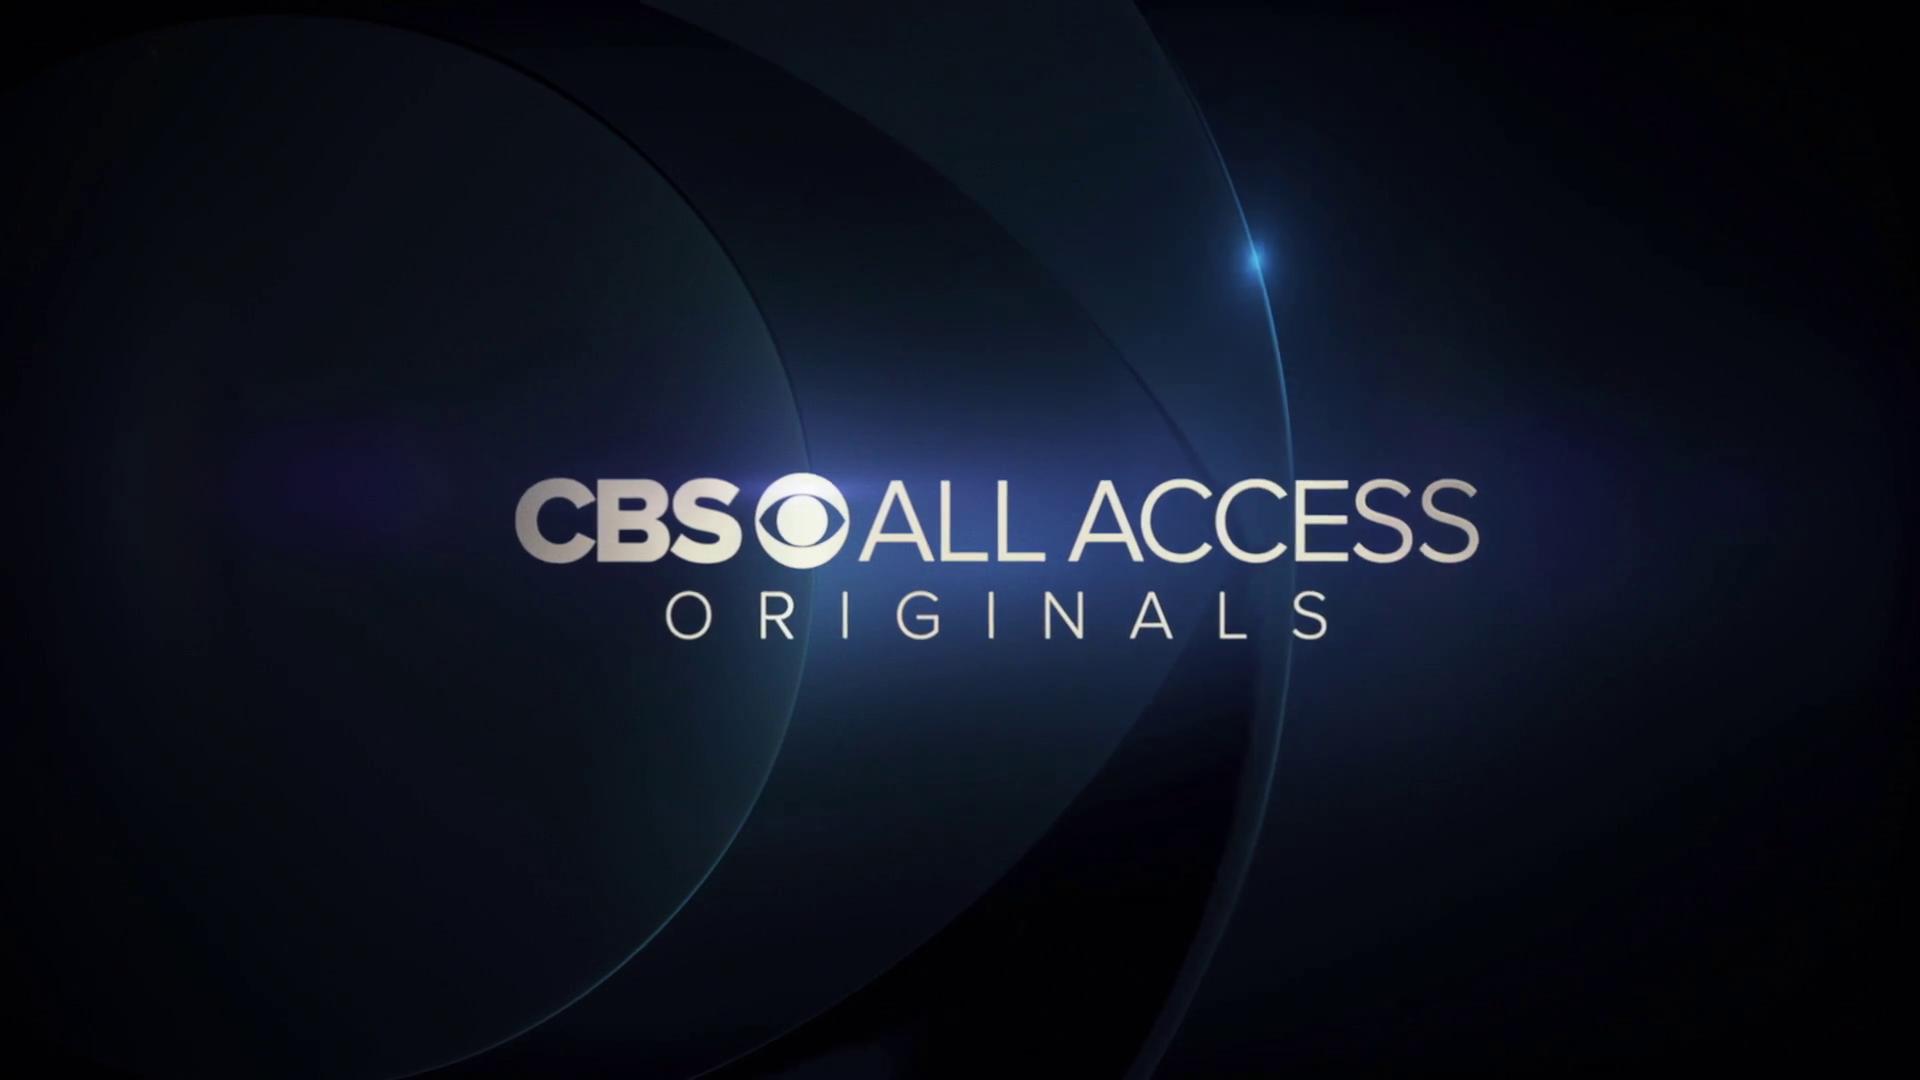 CBS All Access Originals/Other